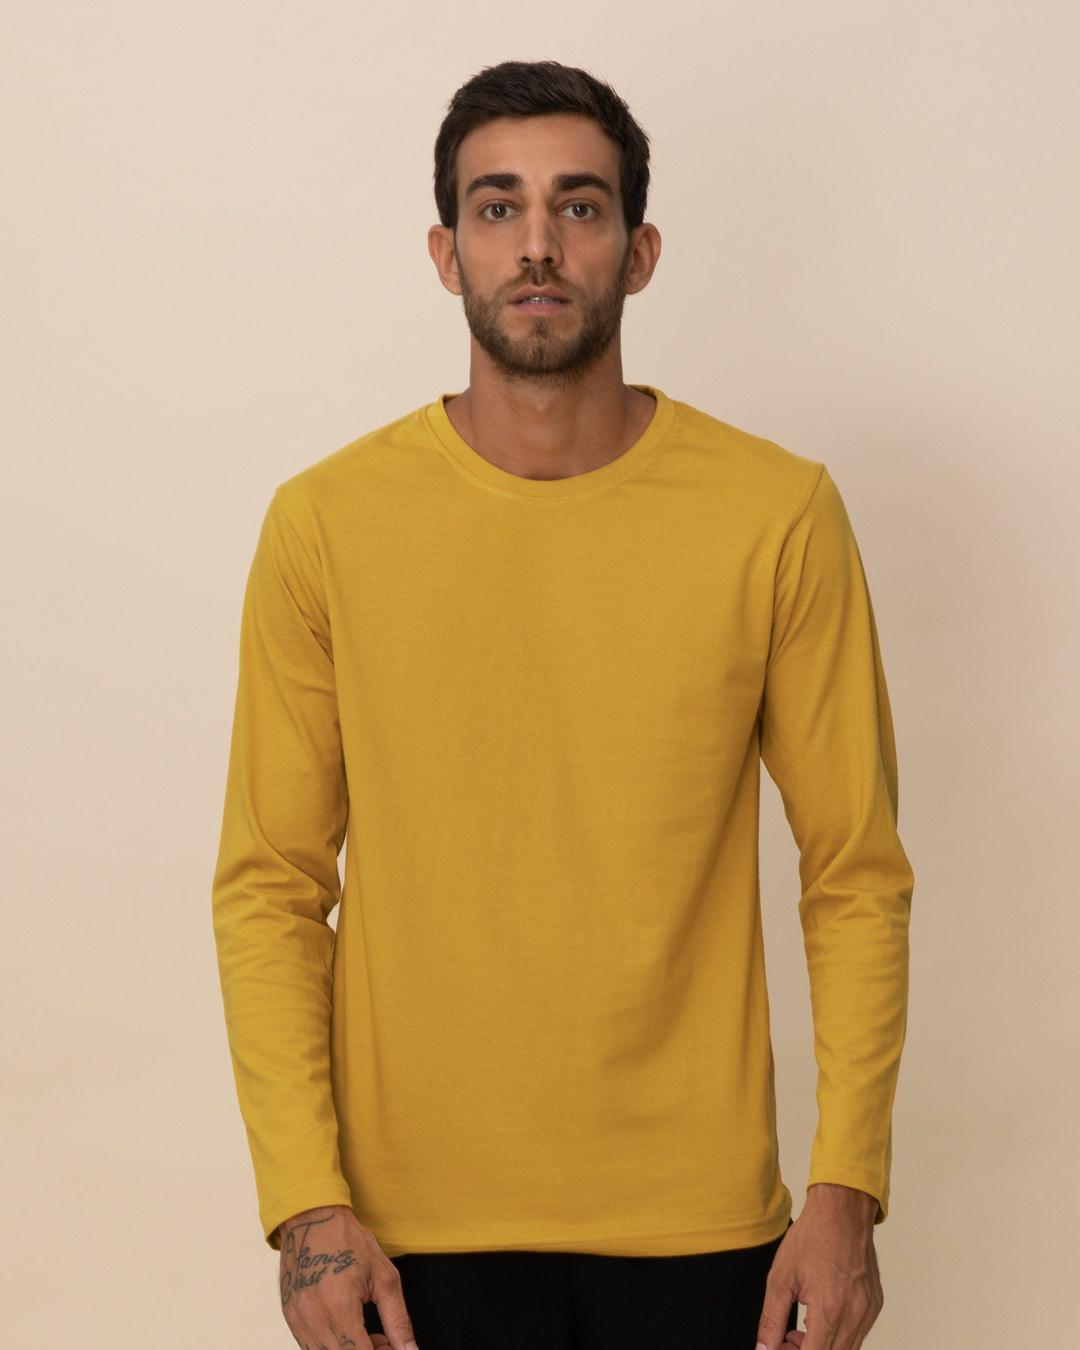 Buy Mustard Yellow Plain Full Sleeve T Shirt For Men Online India Bewakoof Com